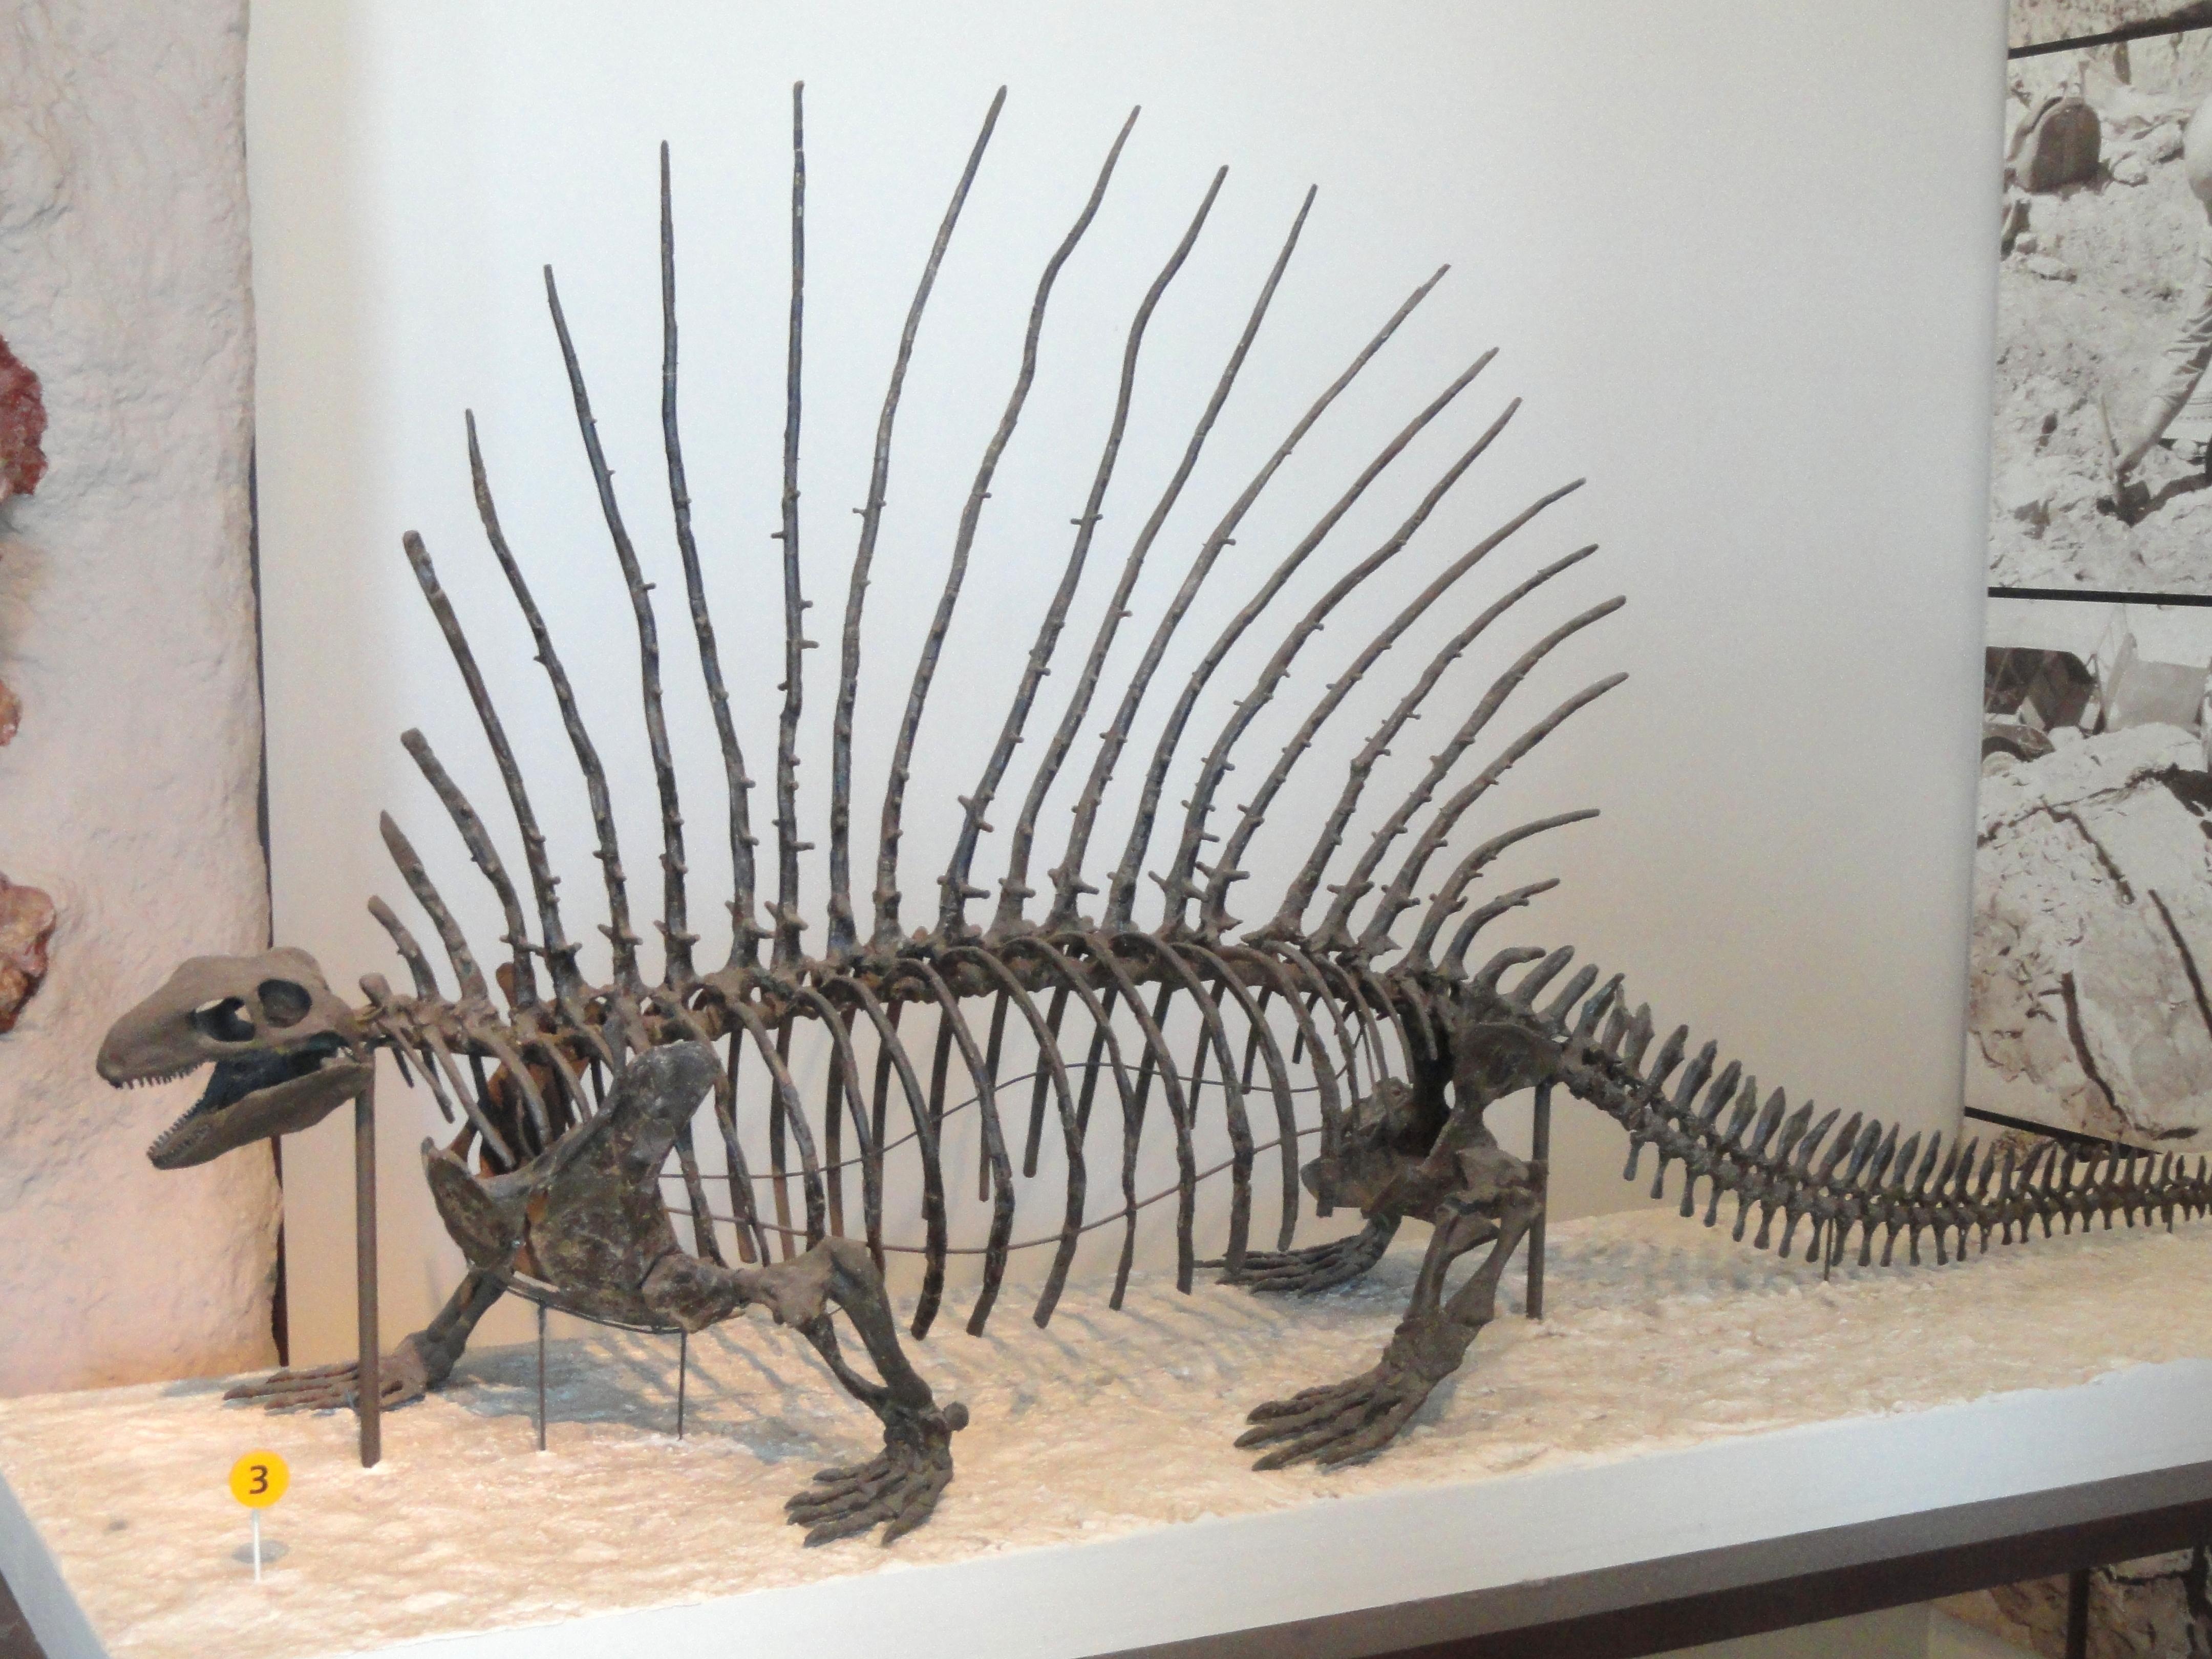 dimetrodon steckbrief